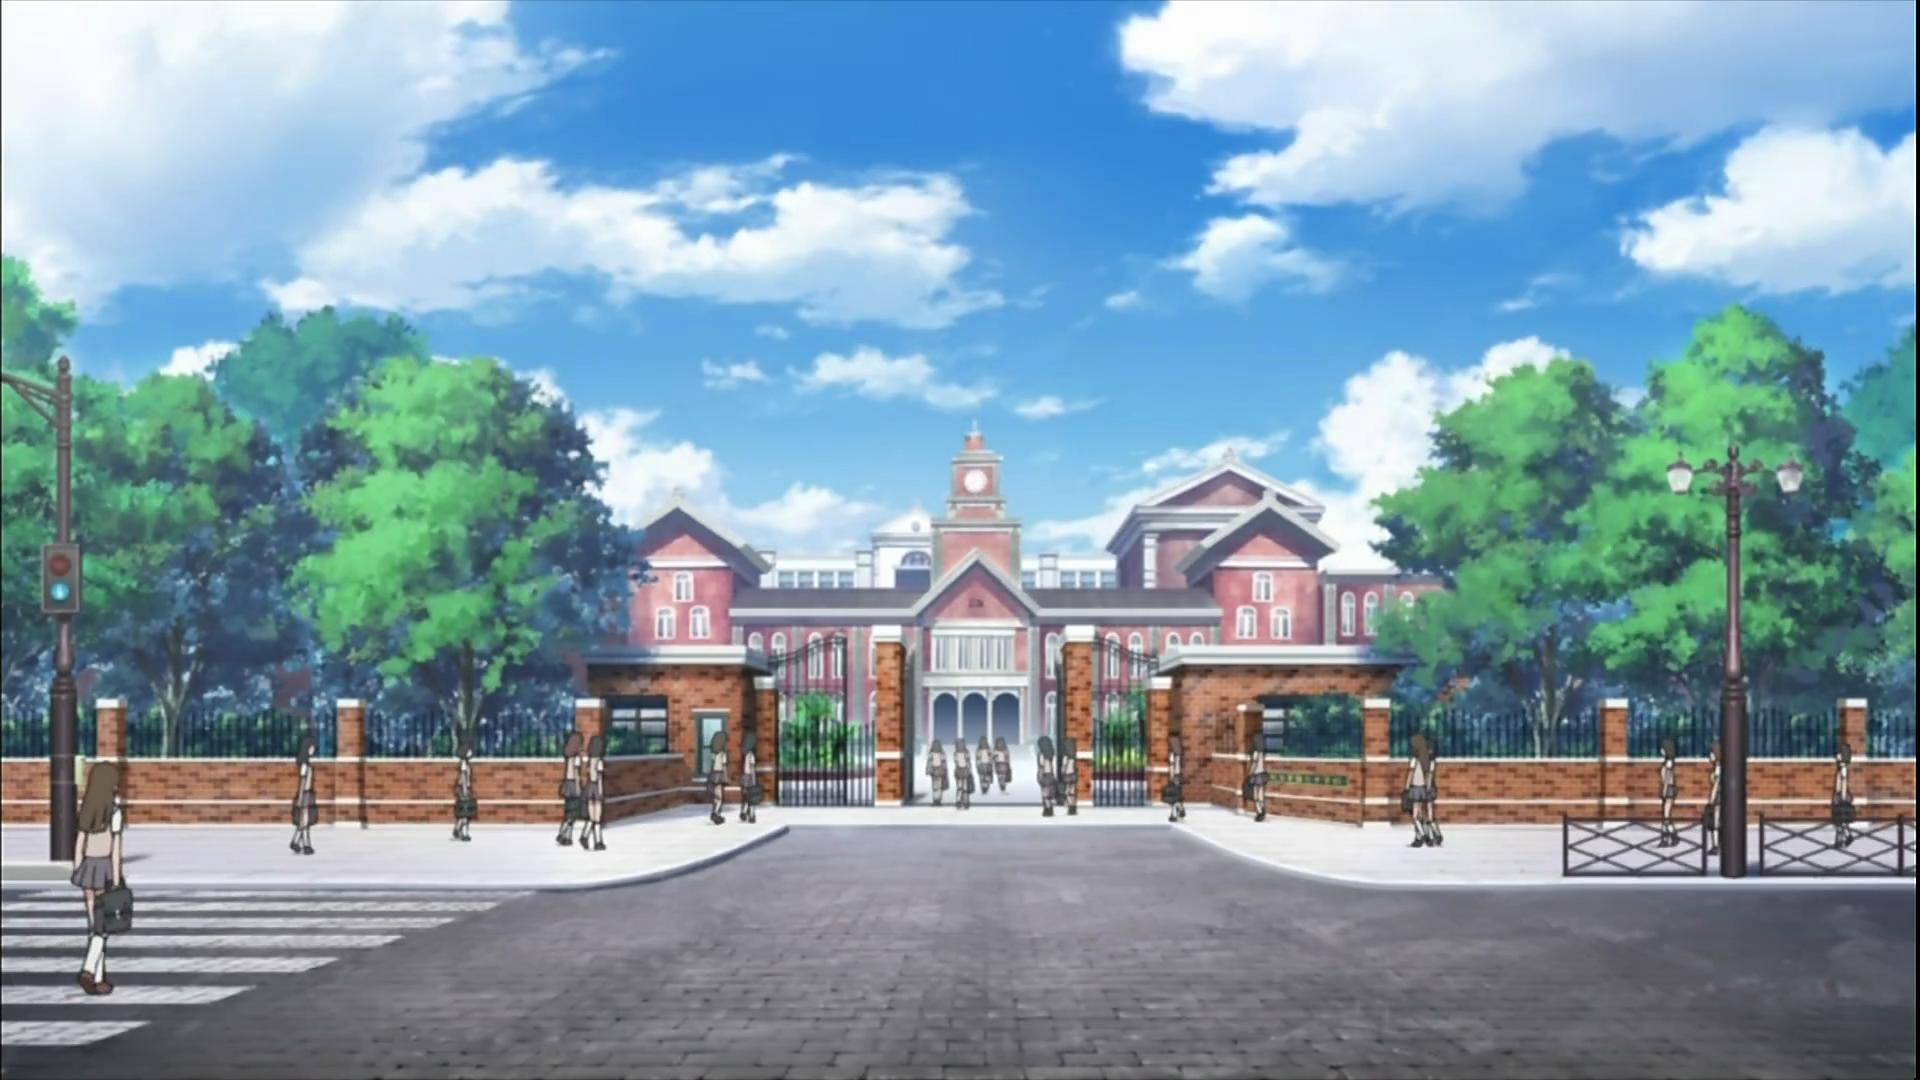 10,000 Anime Fans Voted for the Fictional Schools They Want to Study At haruhichan.com Tokiwadai Middle School Toaru Majutsu no Index  Toaru Kagaku no Railgun